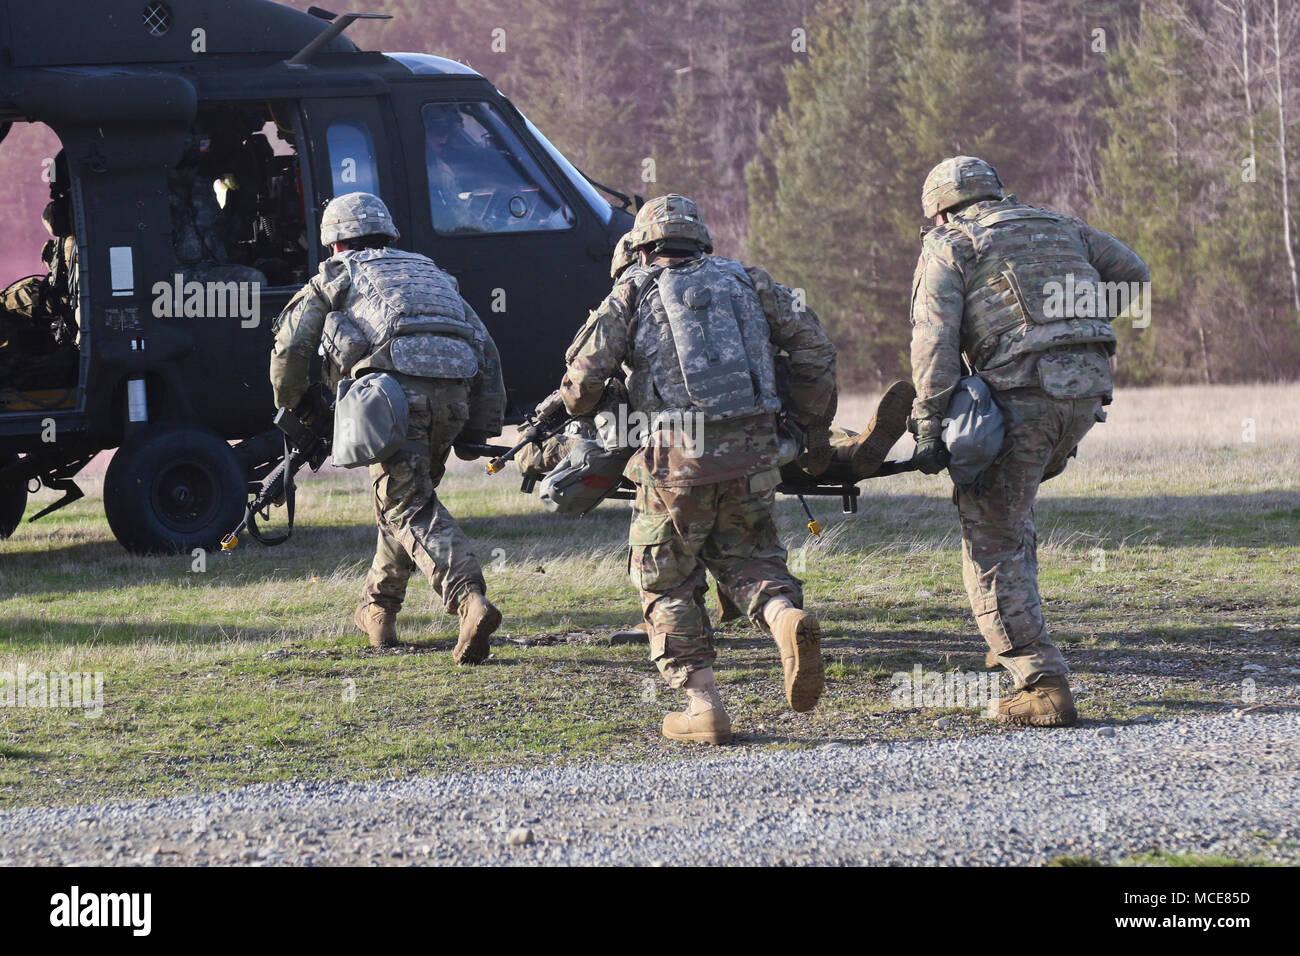 1b3569644 Sgt. 1st Class Dustin Springer, 1st Sgt. James Shockley, Staff Sgt.